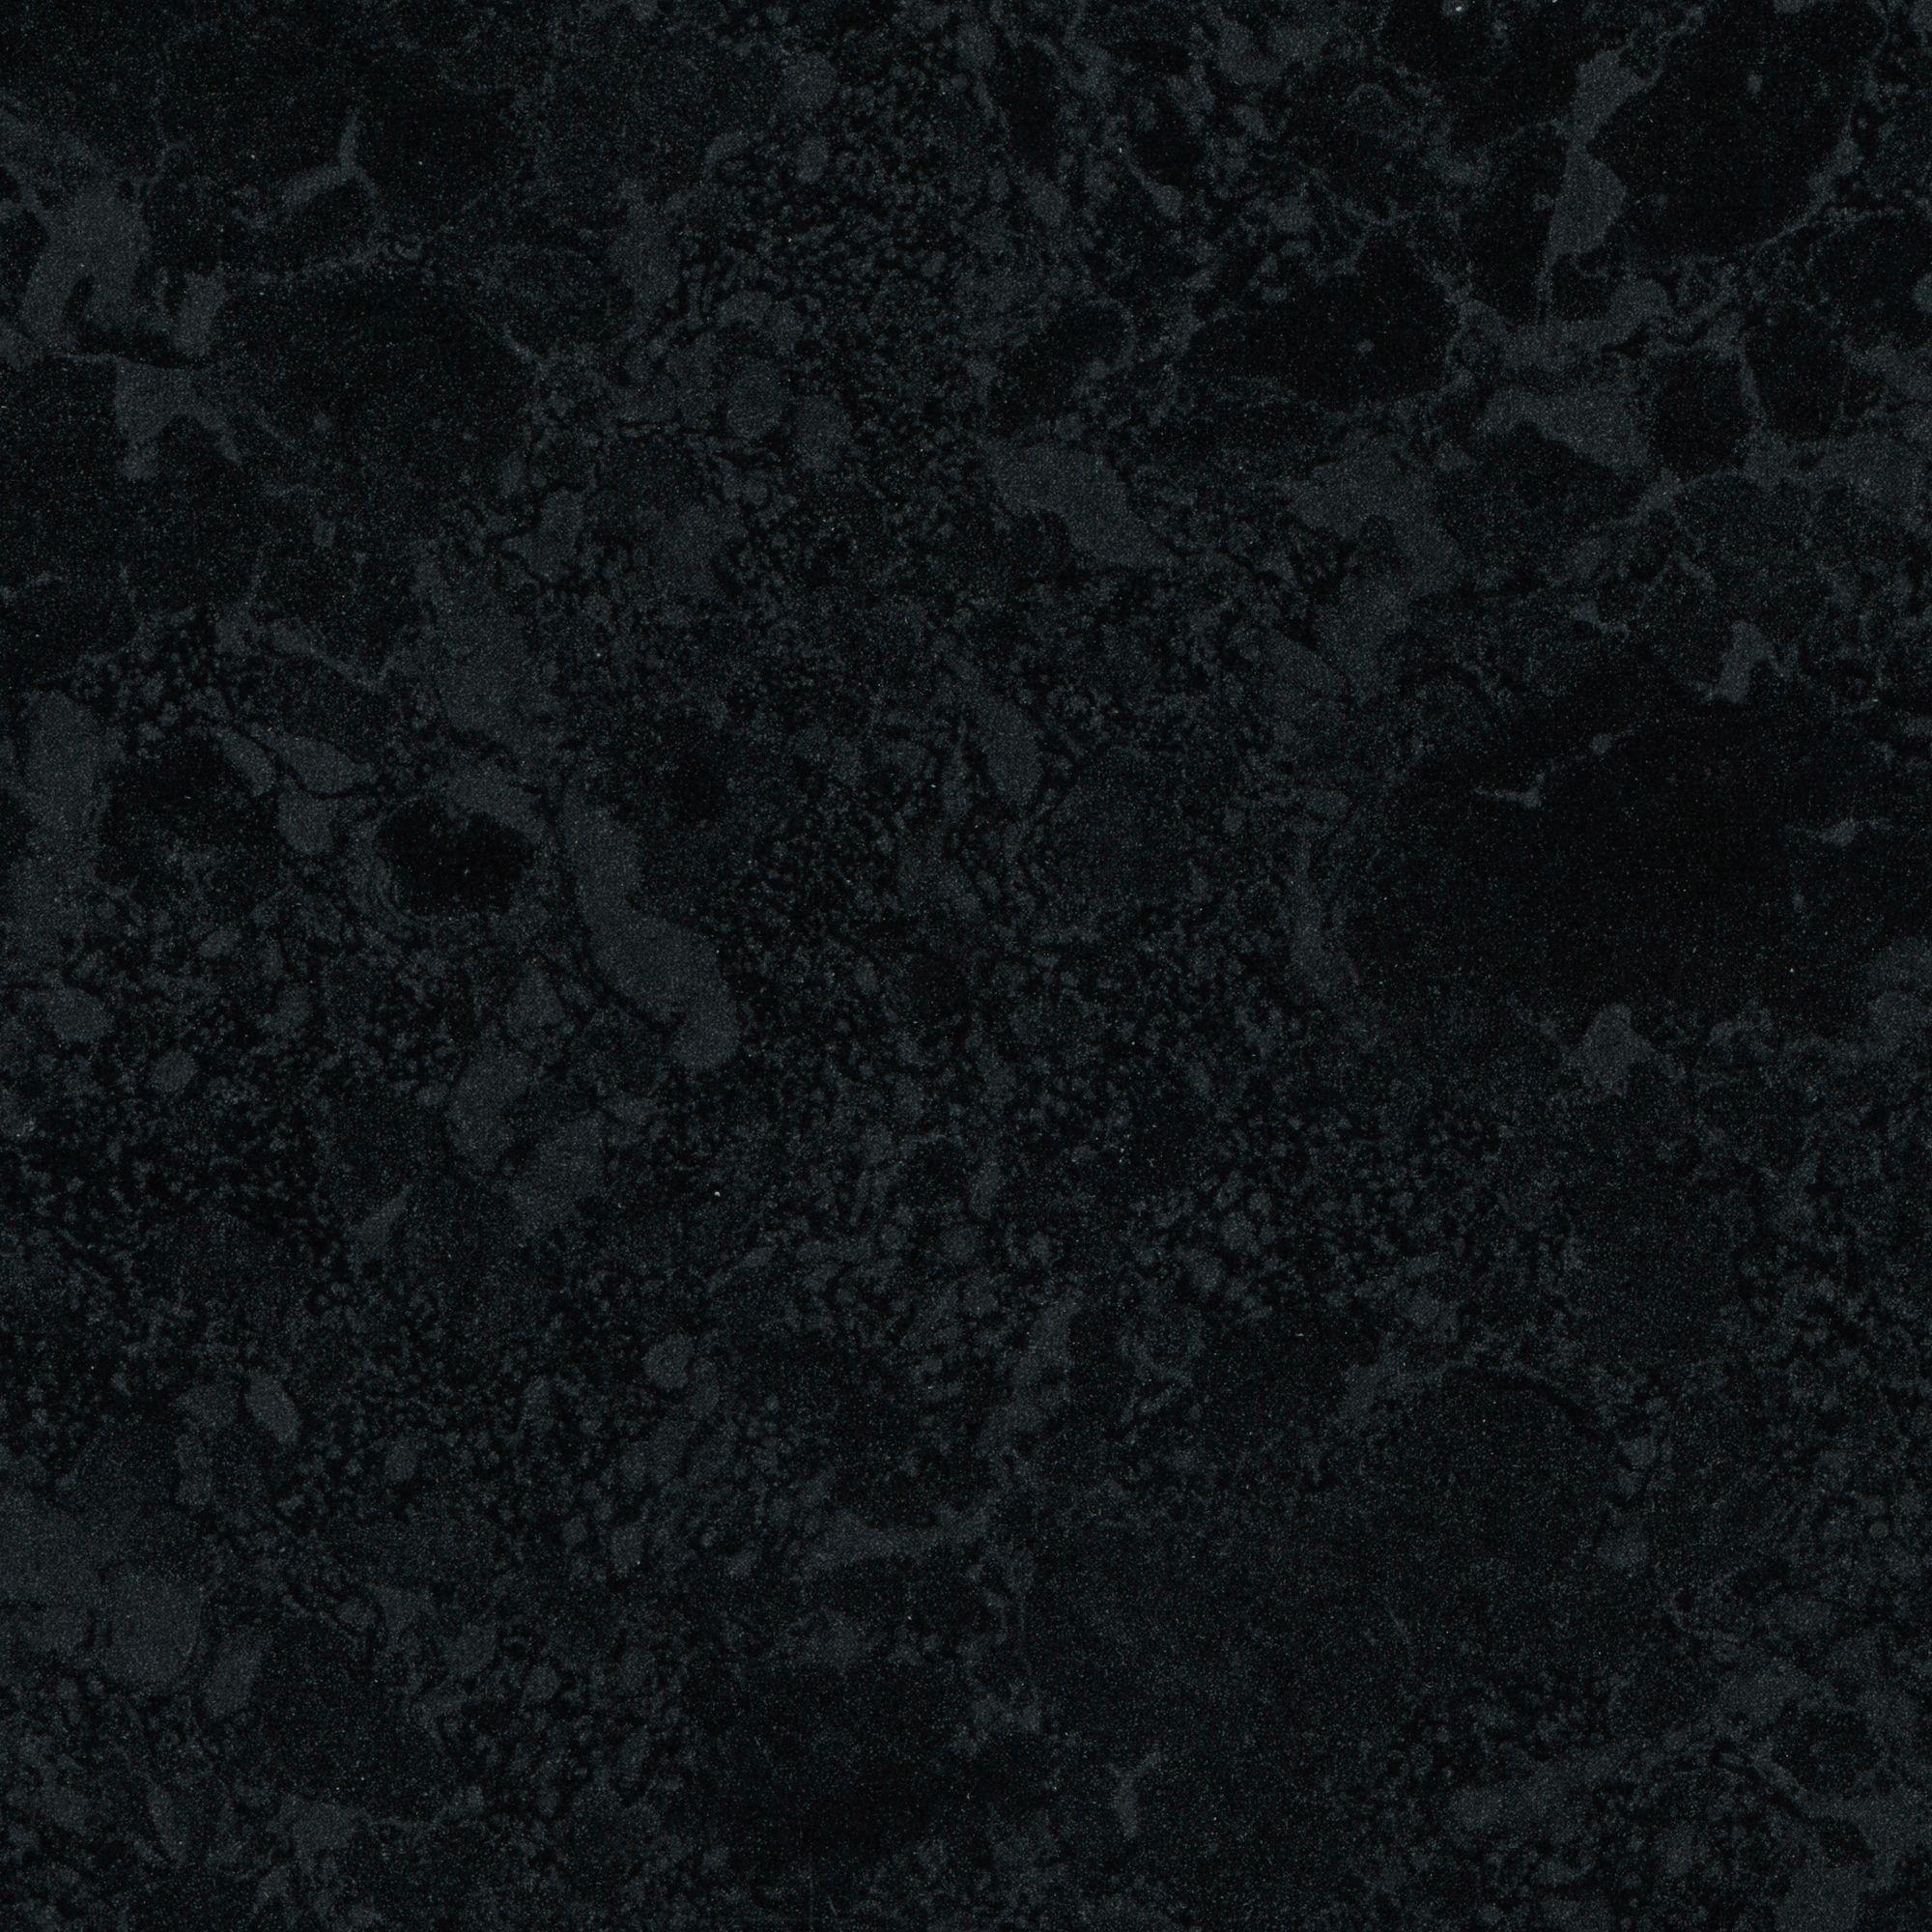 Bathroom worktops b q - 28mm Midnight Granite Black Gloss Stone Effect Round Edge Worktop L 2000mm D 365mm Departments Diy At B Q